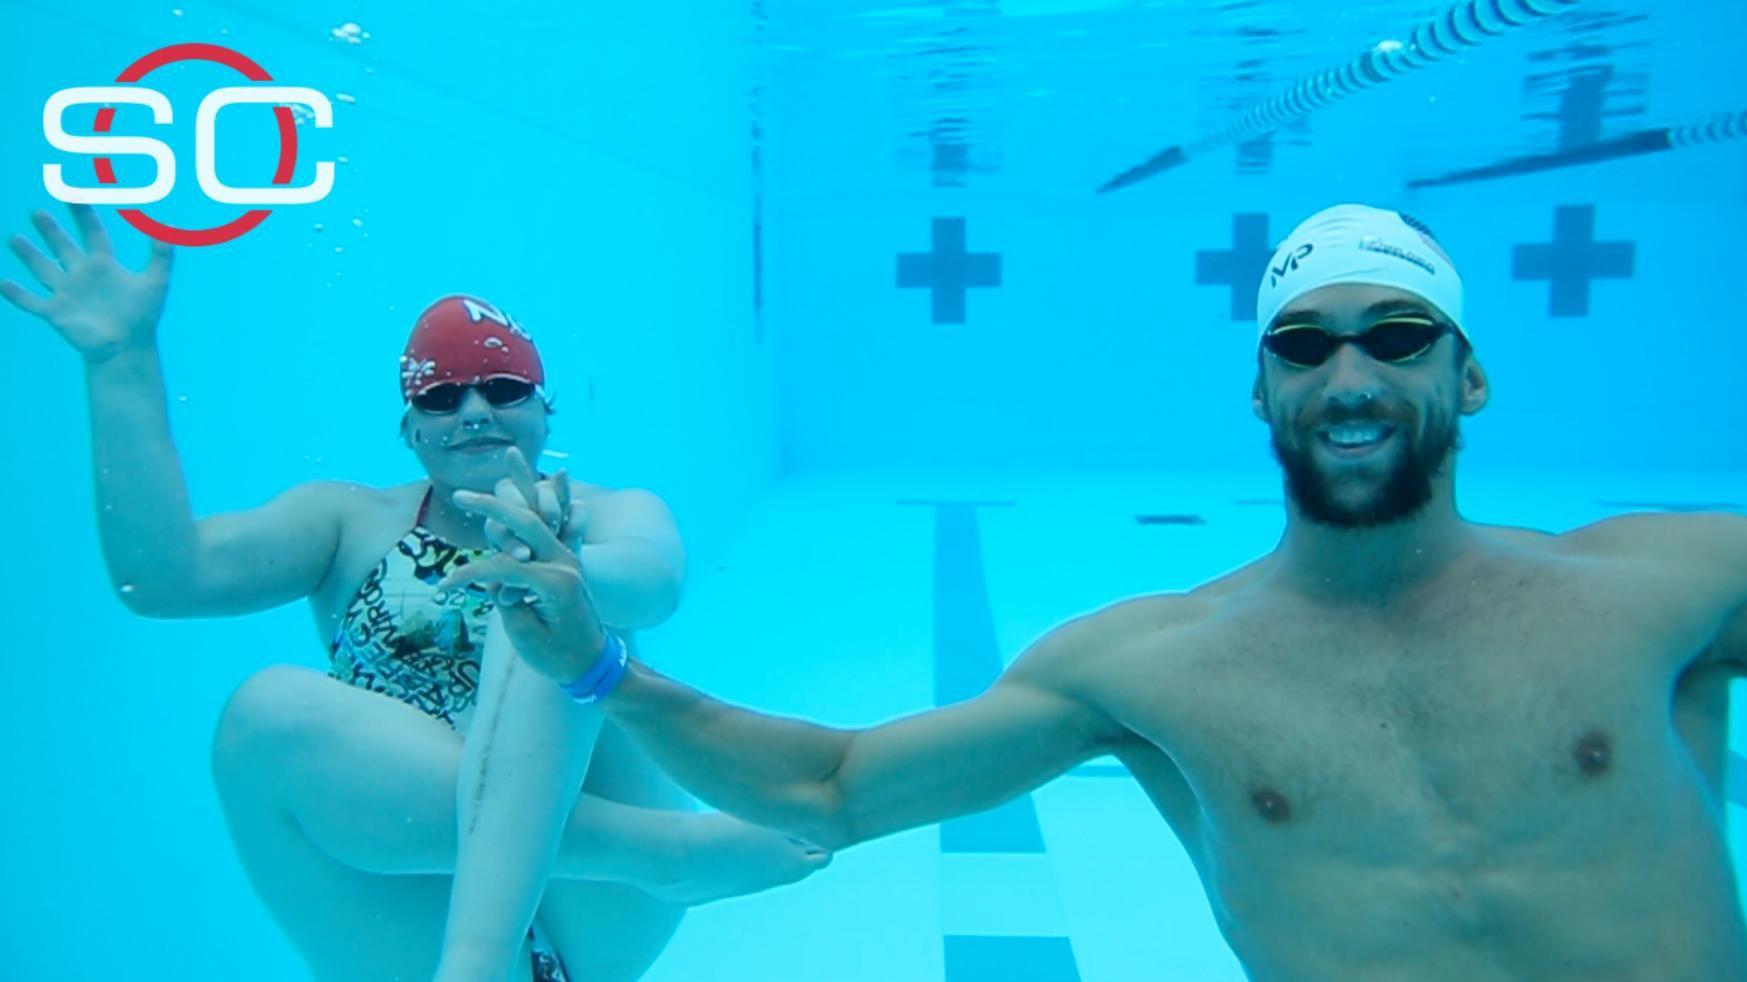 My Wish: Michael Phelps